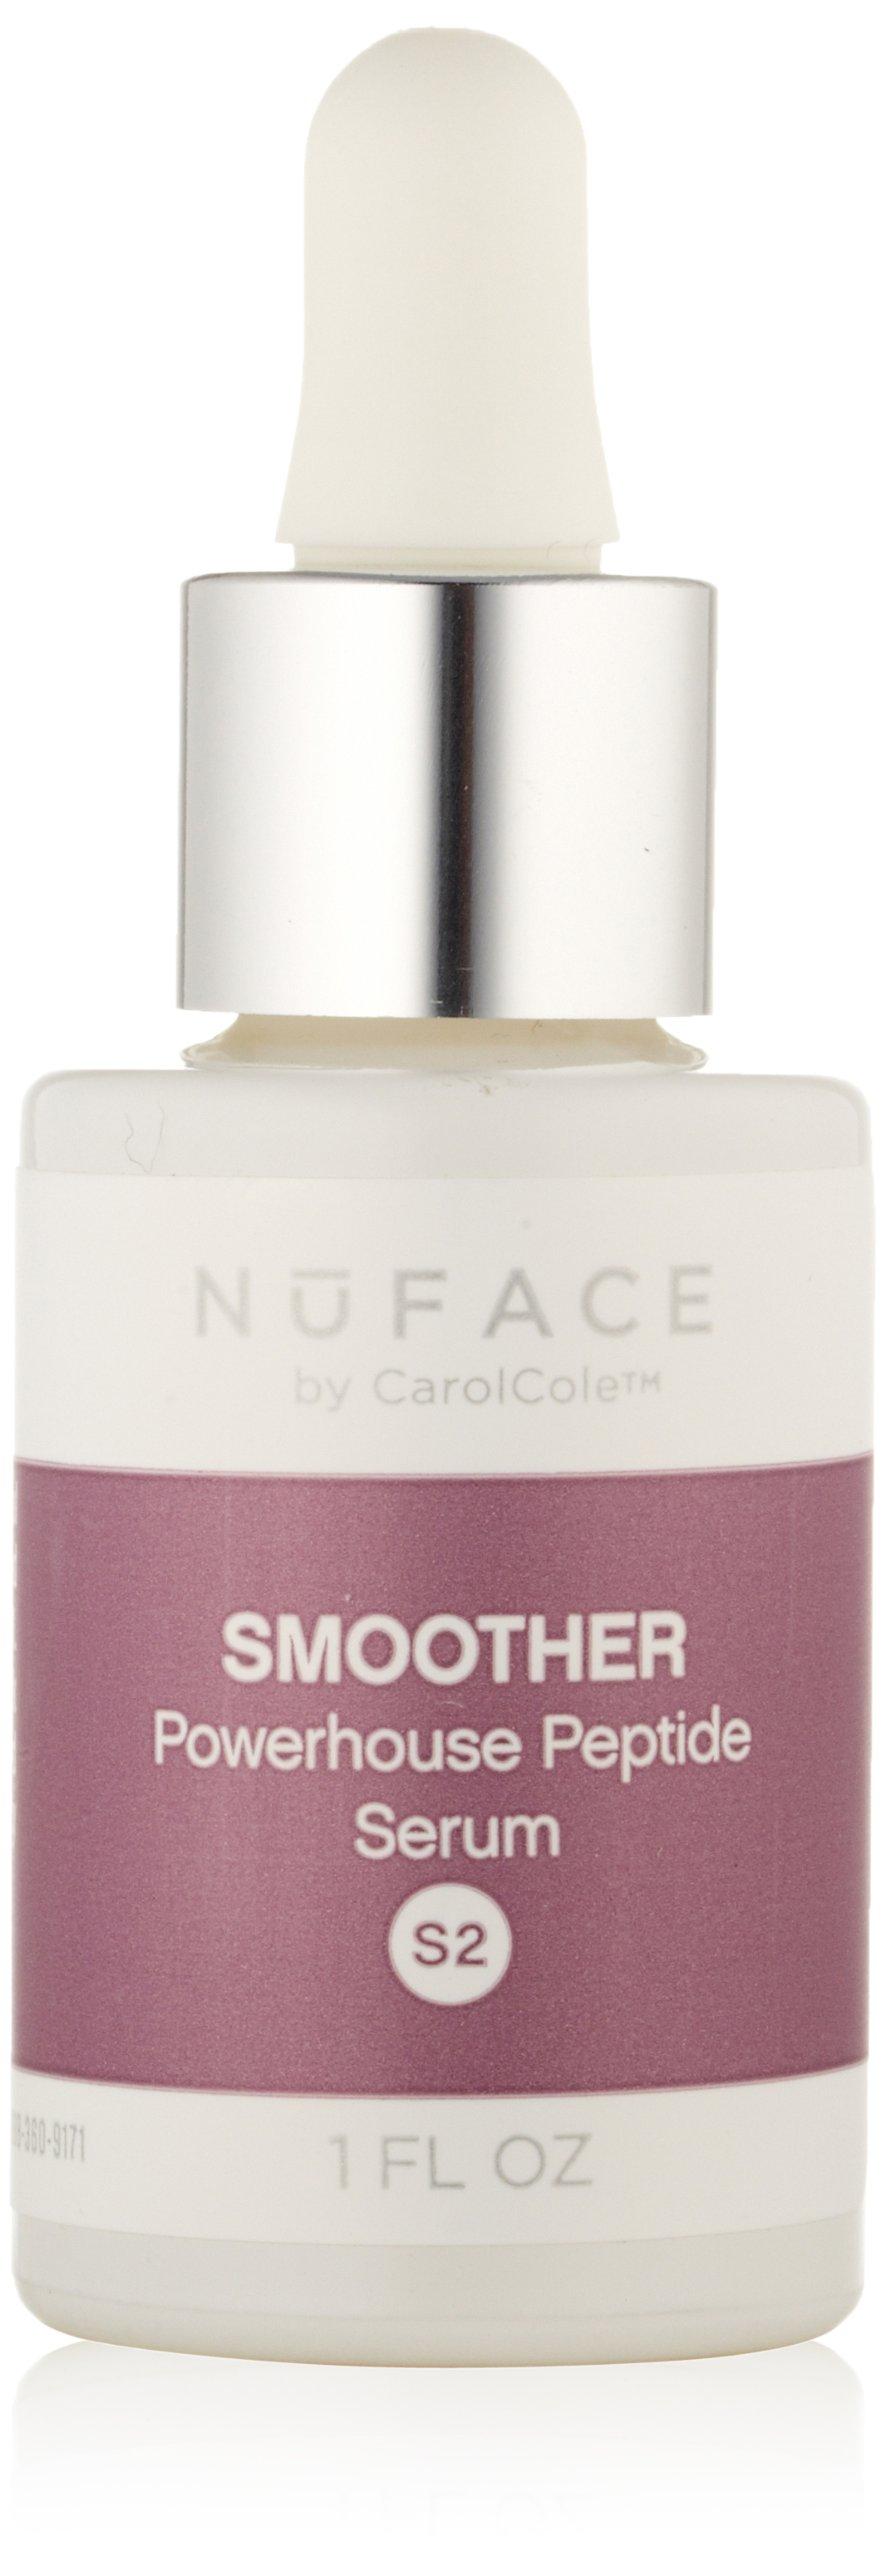 NuFACE Smoother Powerhouse Peptide Serum, 1 fl. oz.